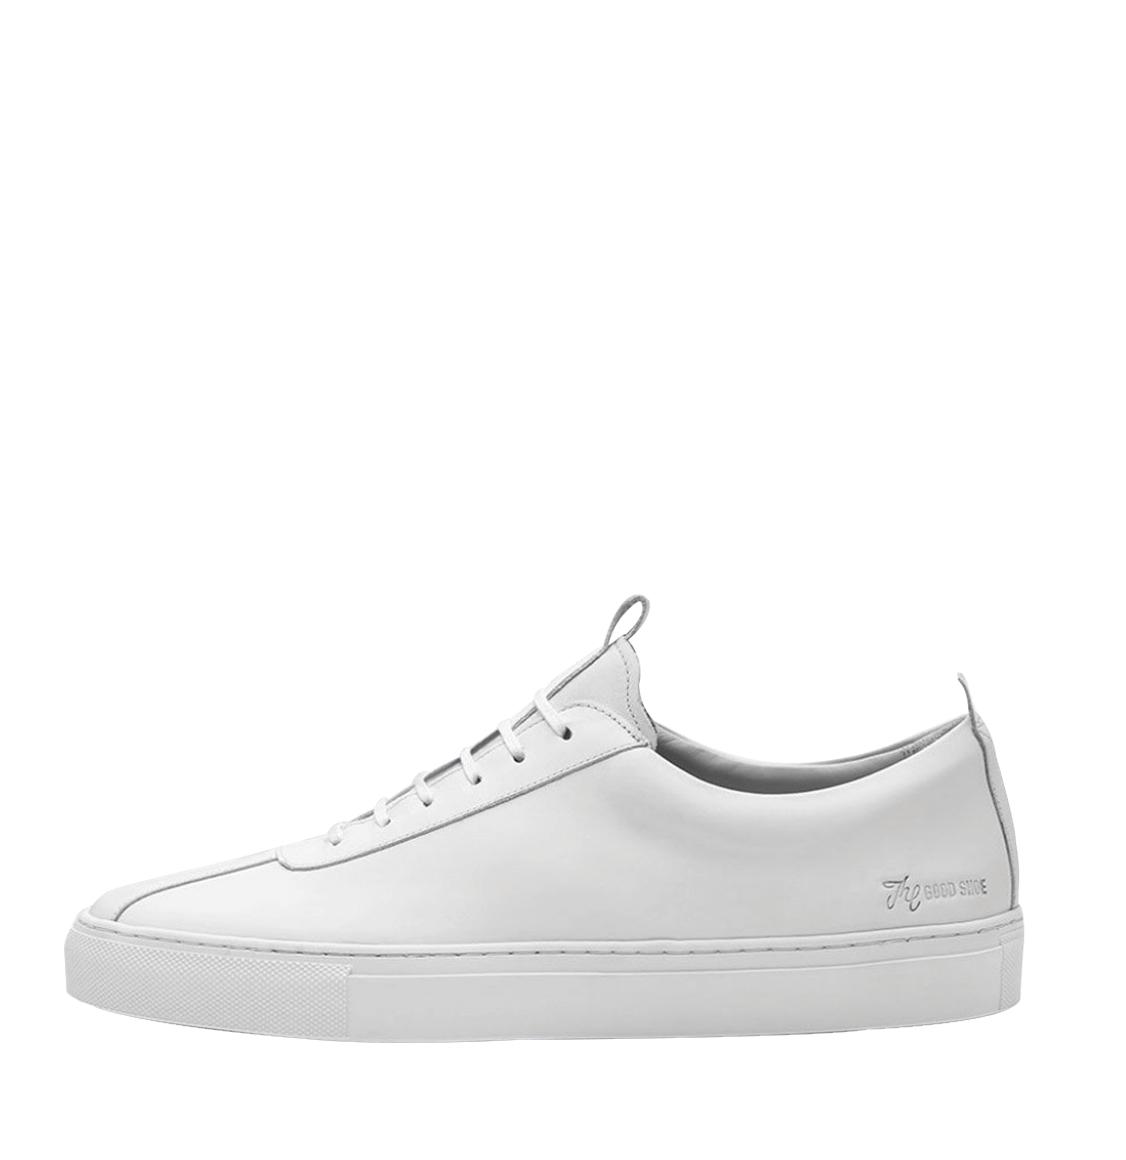 Grenson White Leather Oxford Sneaker